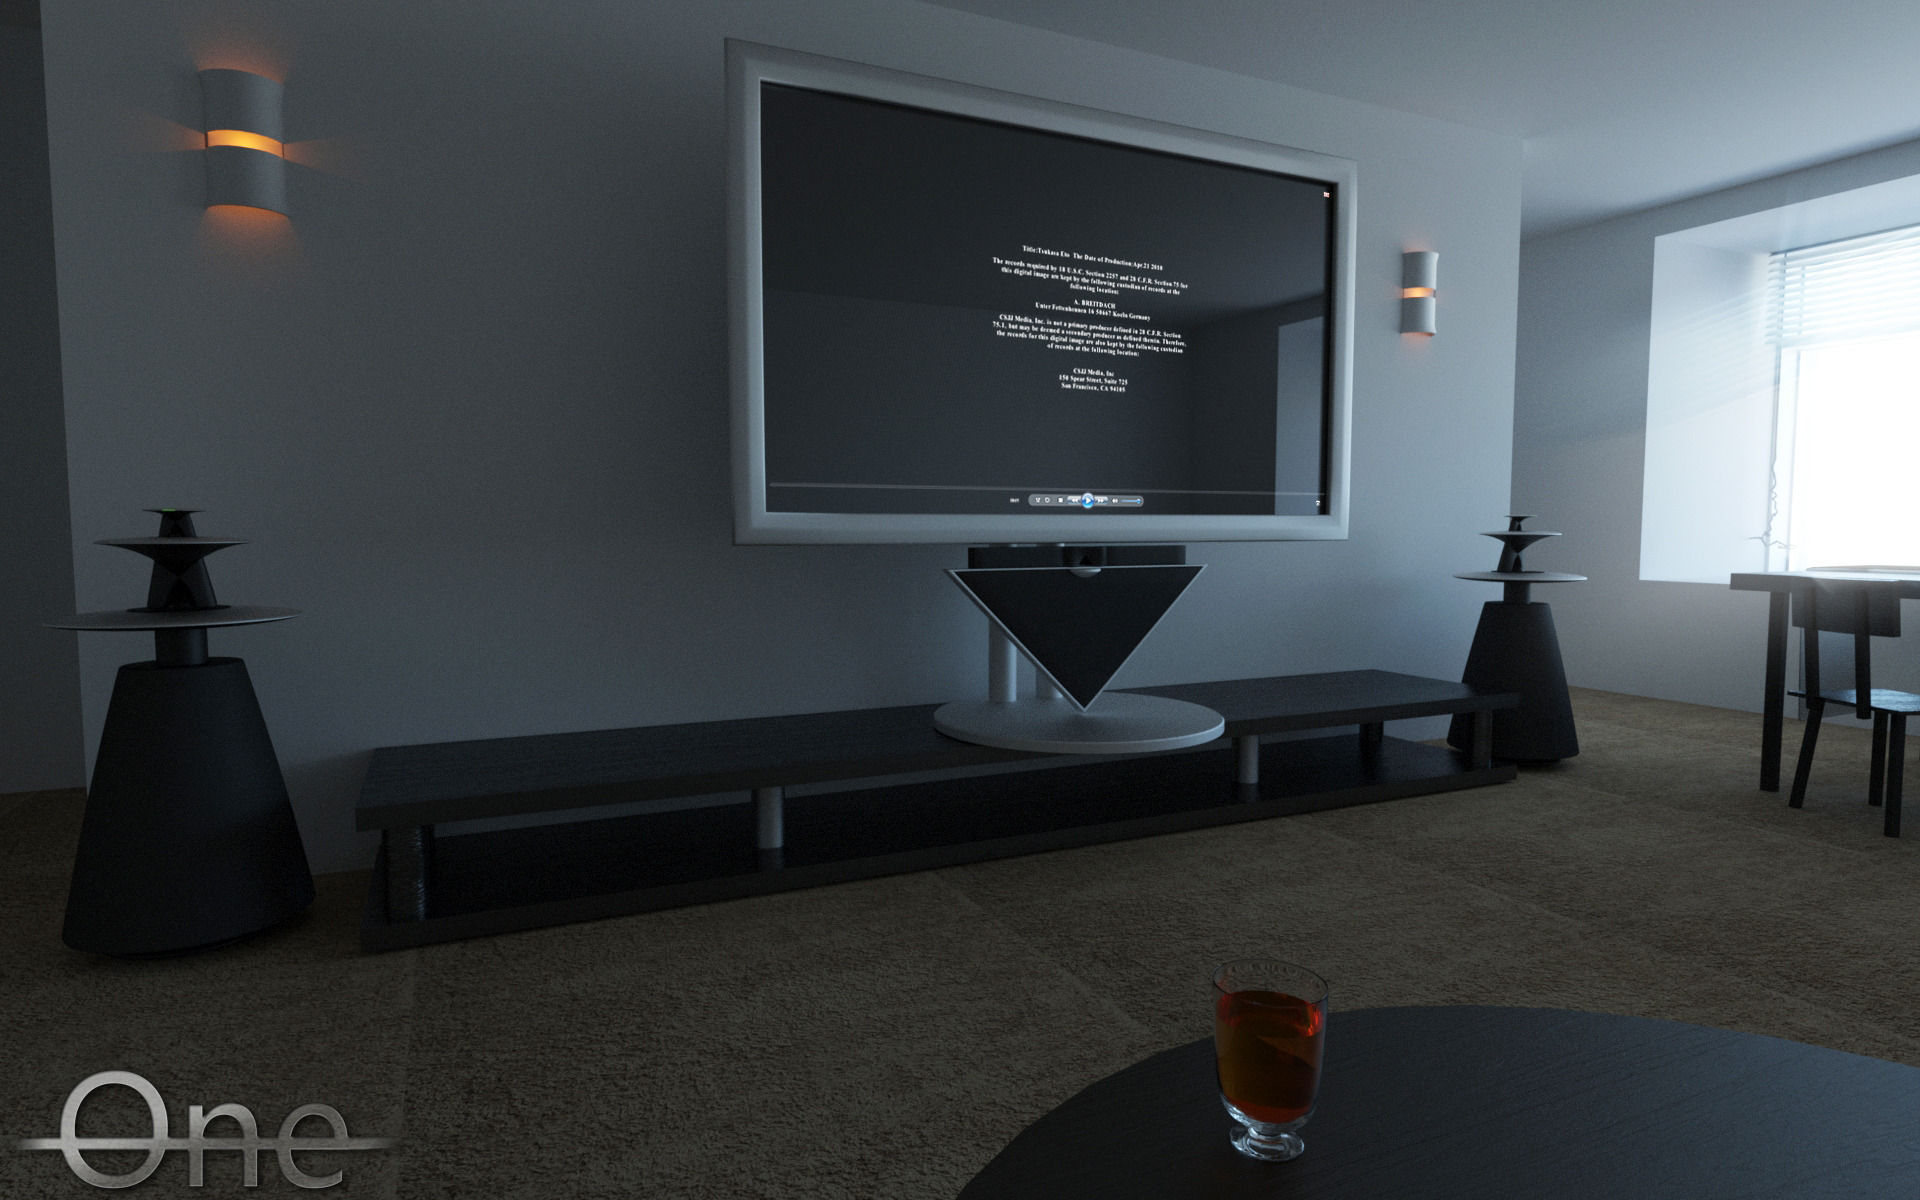 bang olufsen beolab 5 beovision 4 3d model animated max. Black Bedroom Furniture Sets. Home Design Ideas